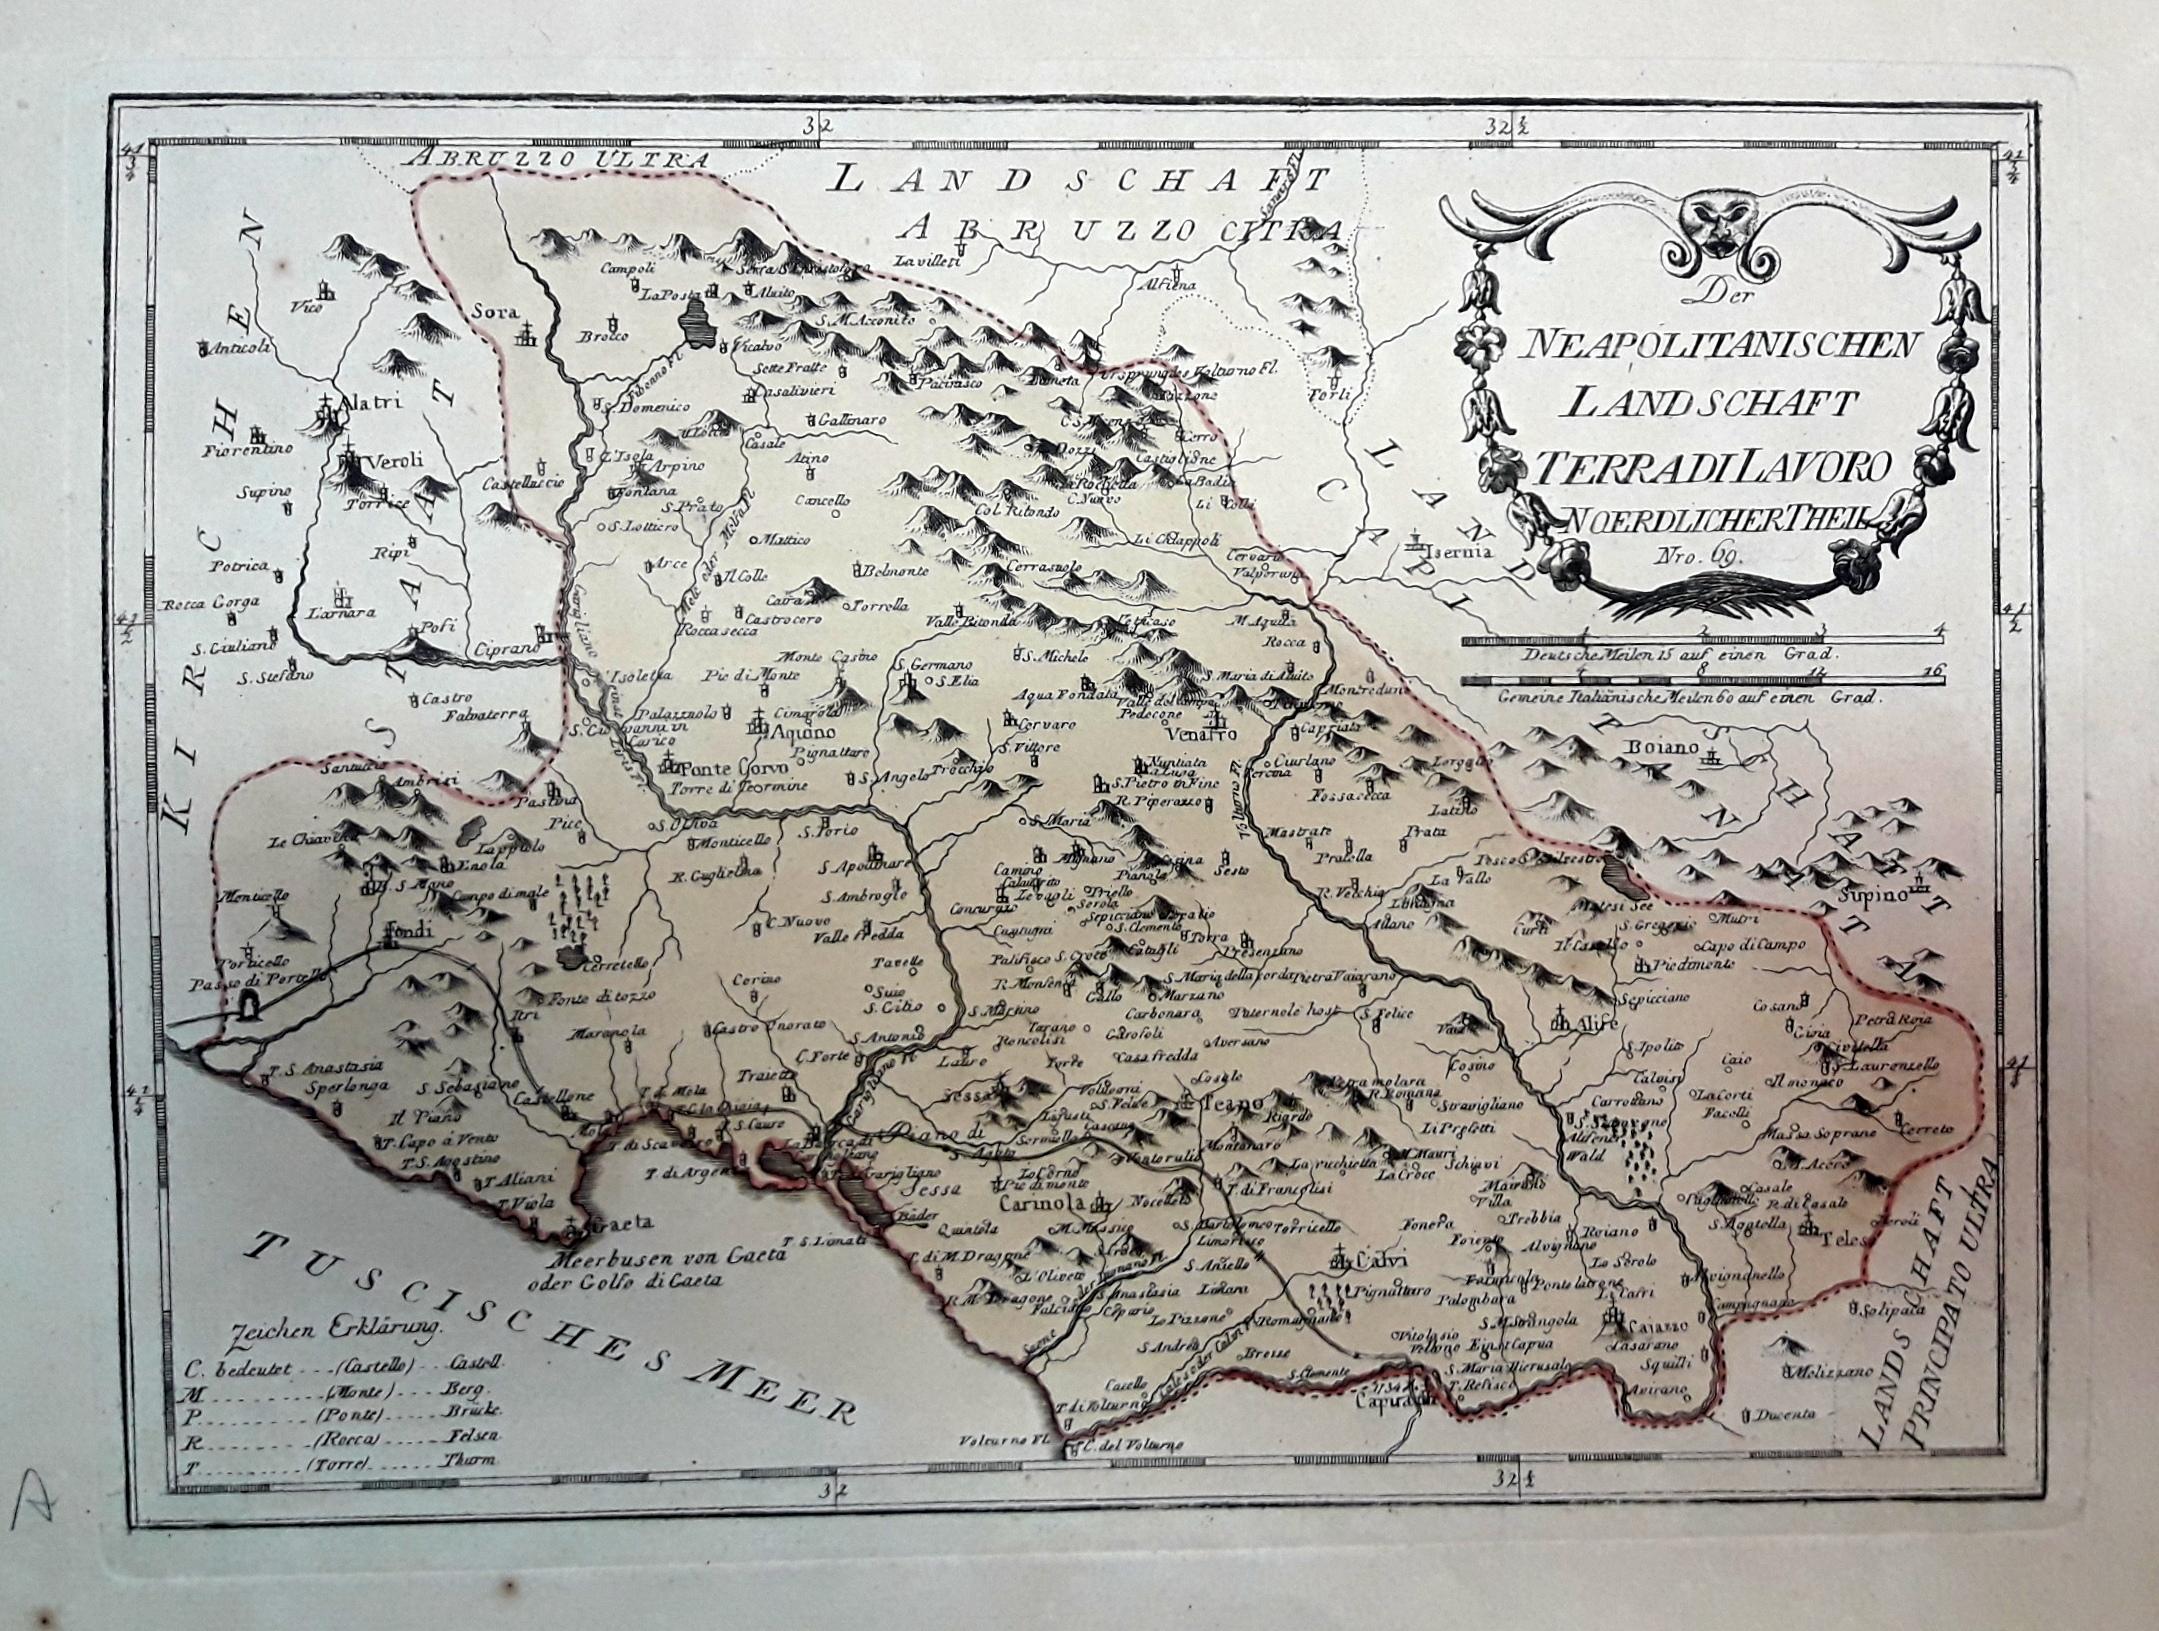 Cartina Geografica Provincia Di Teramo.1791 Terra Di Lavoro Neapolitanischen Landschaft Reilly Franz Johann J